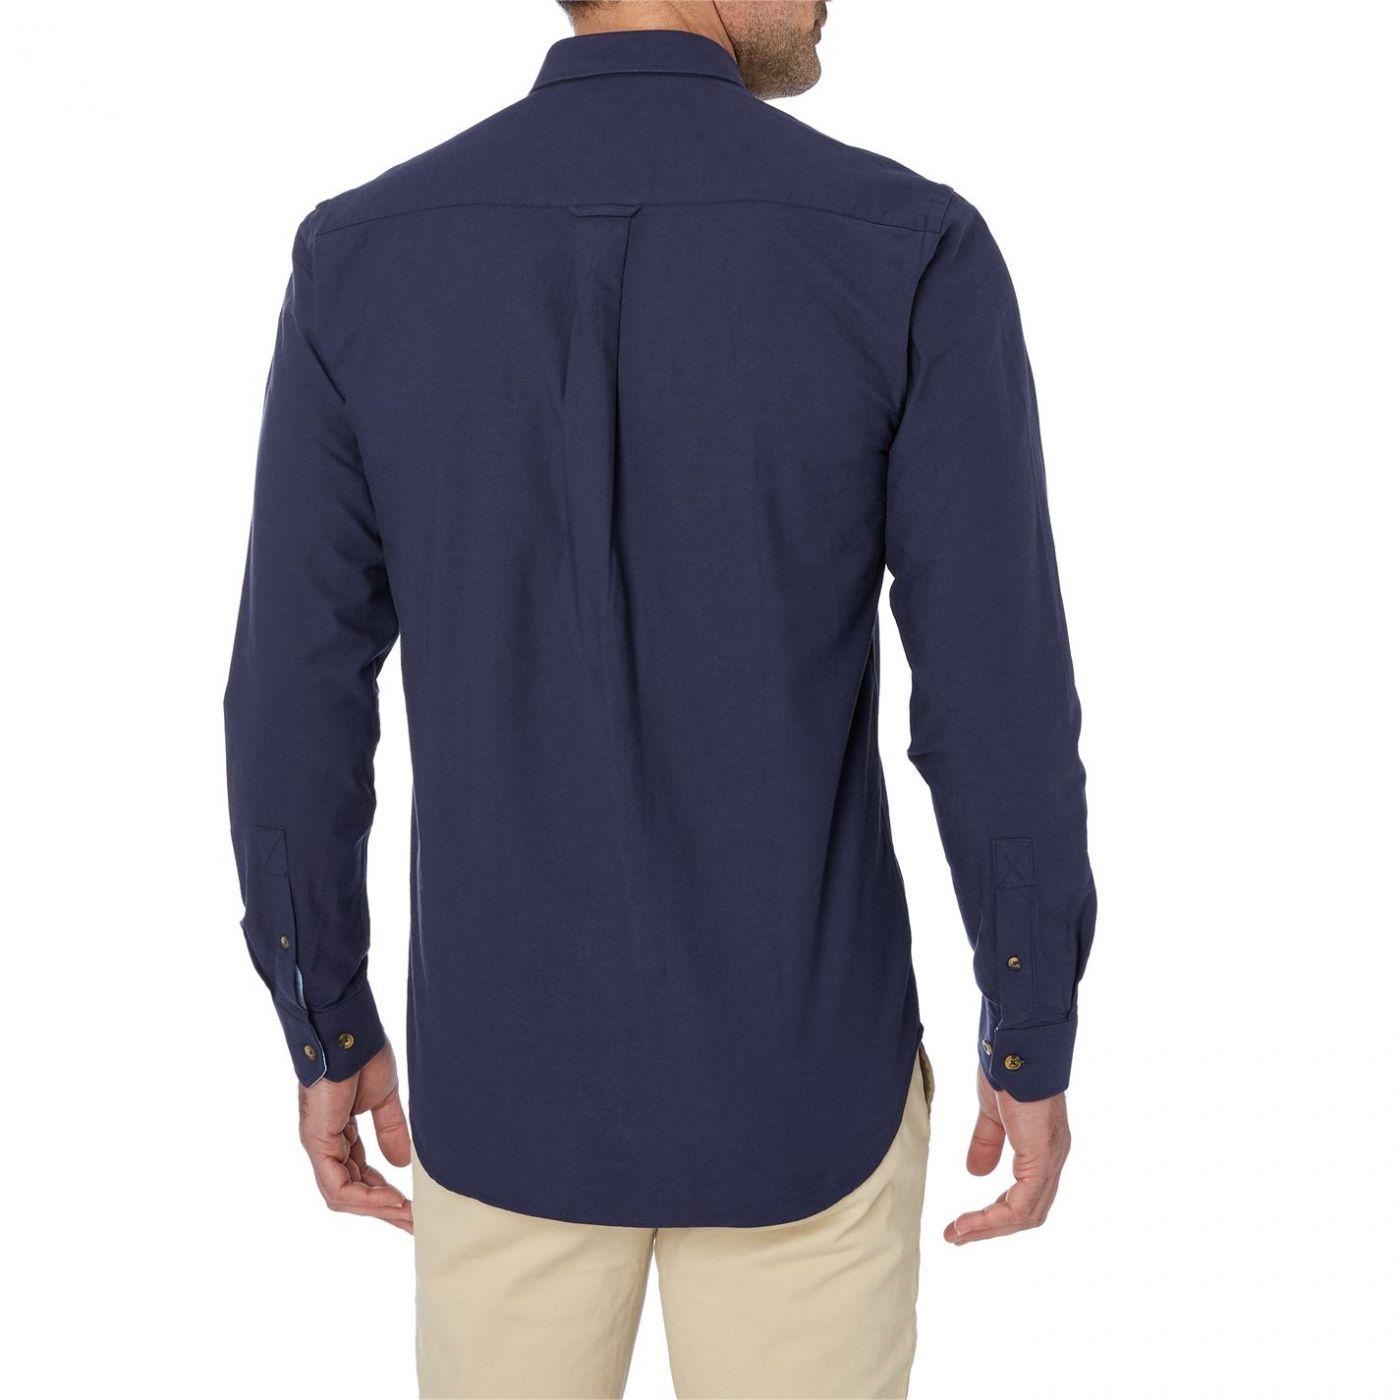 Raging Bull Long Sleeve Oxford Shirt